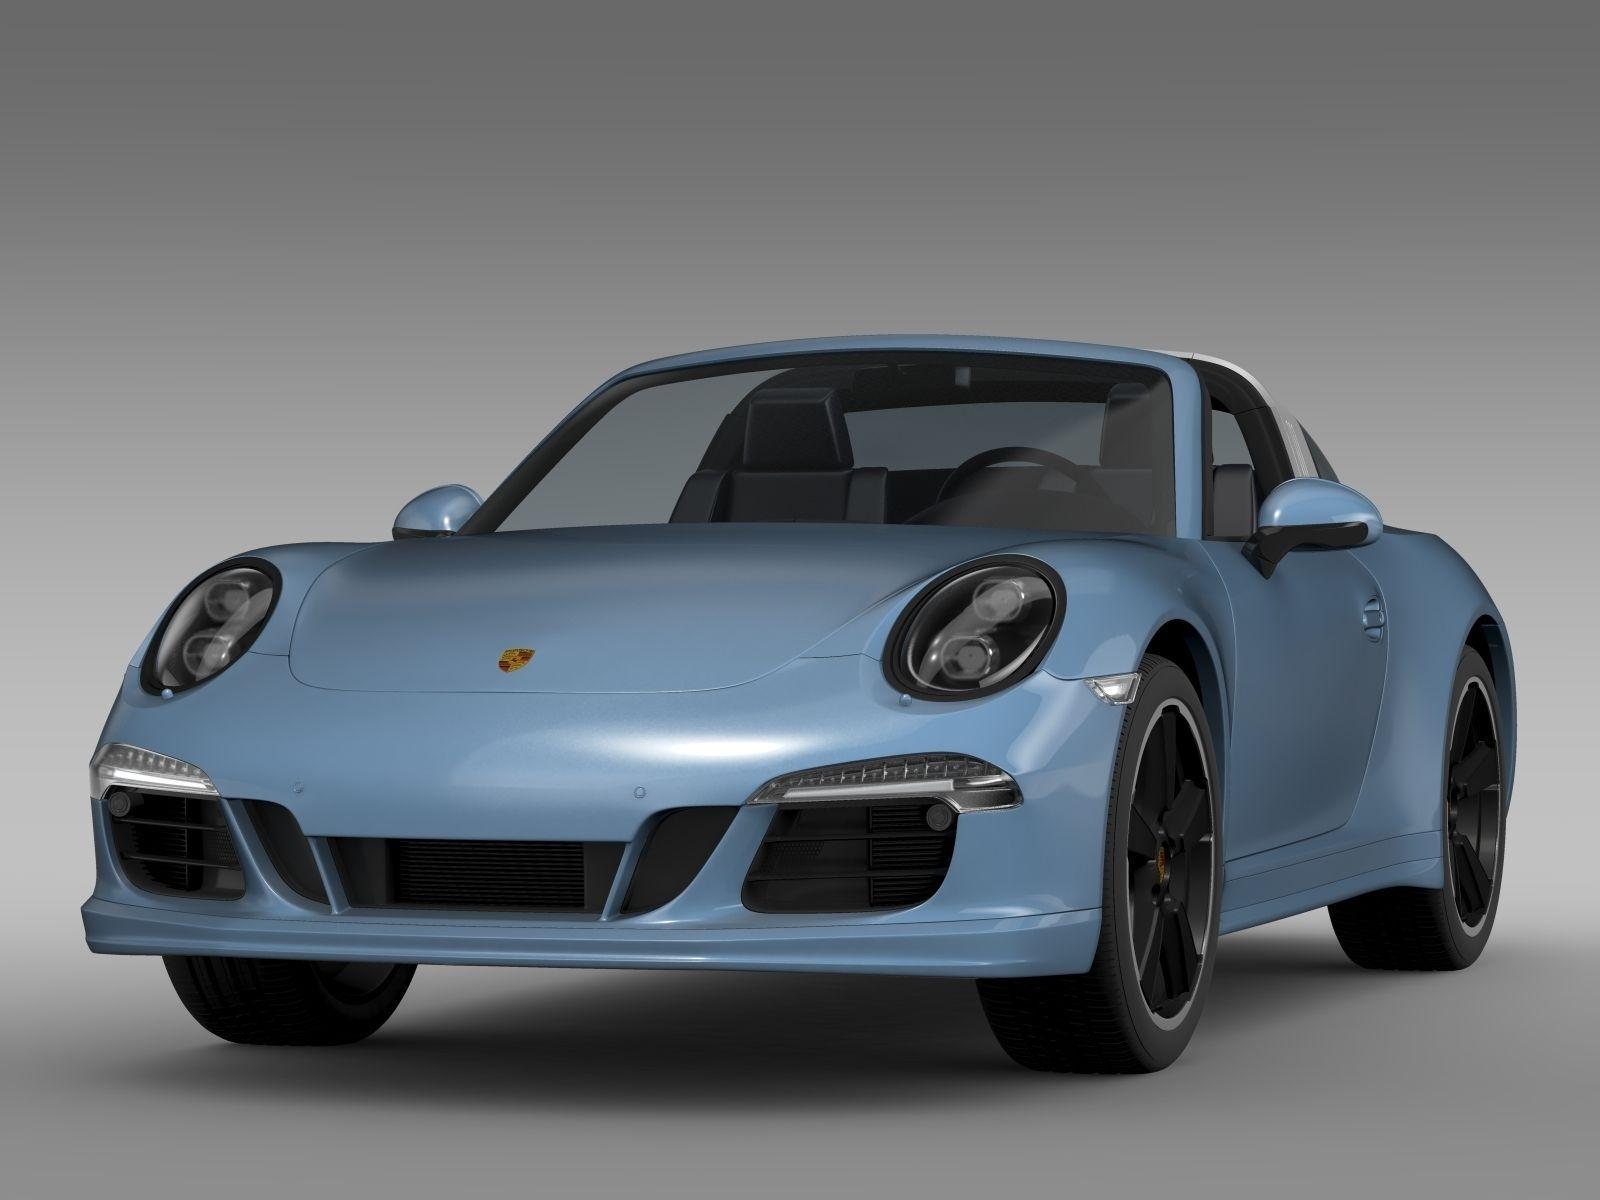 Porsche 911 Targa 4s Exclusive 2015 3d Model Max Obj 3ds